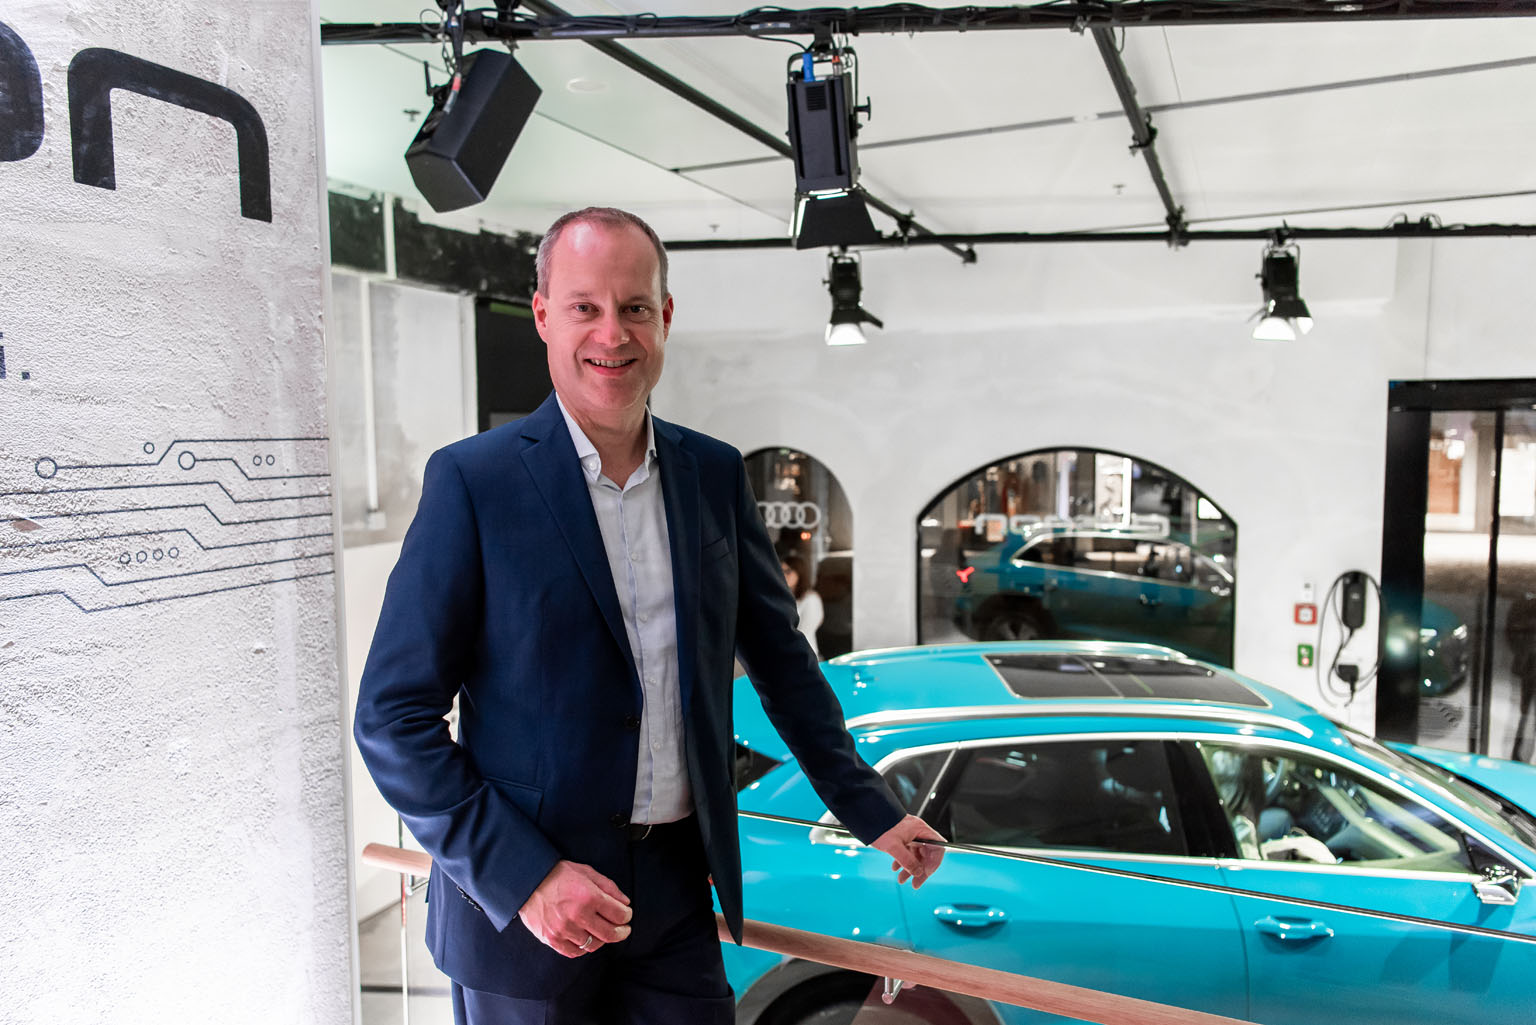 Jens van Eikels im Audi e-tron Pop-up Store in Zürich. (Tom Lüthi)